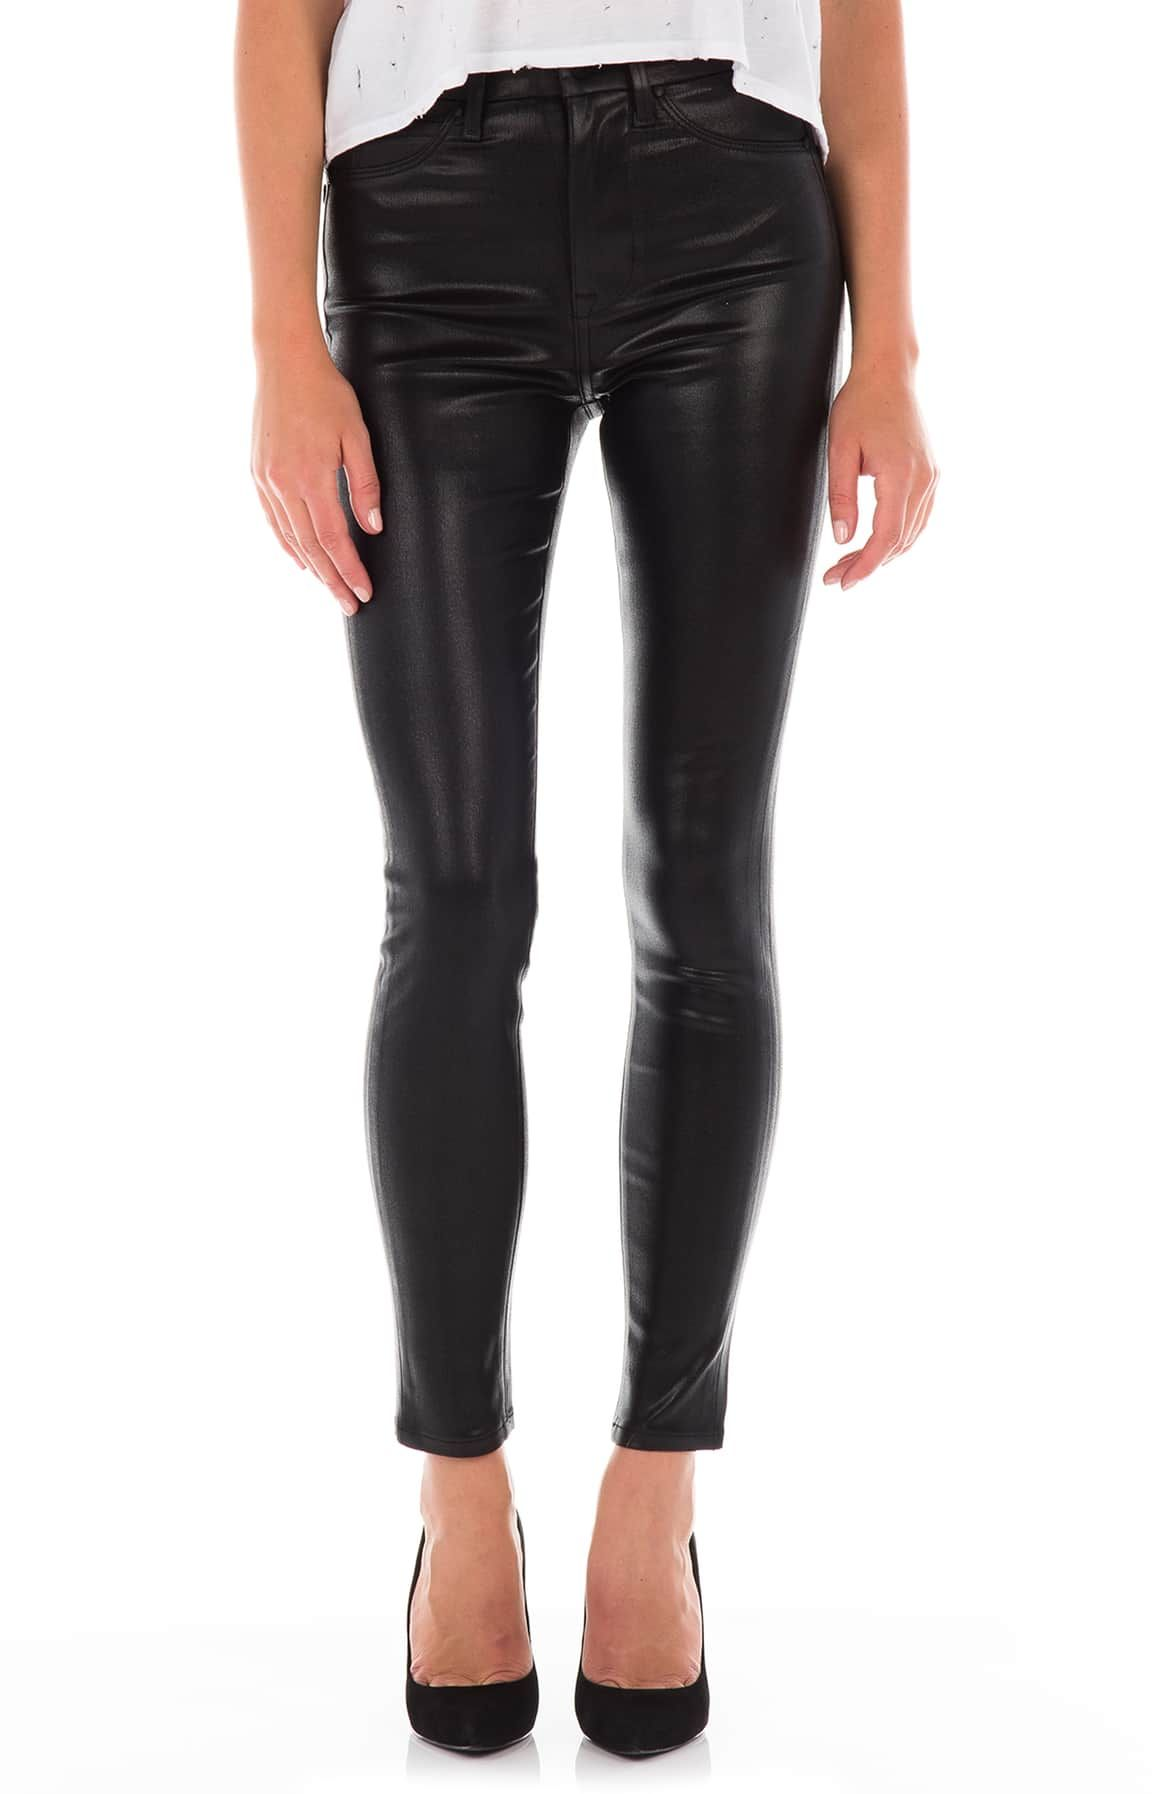 5c0d428a957b28 Luna Coated High Waist Skinny Ankle Jeans, Main, color, … | Wantable ...